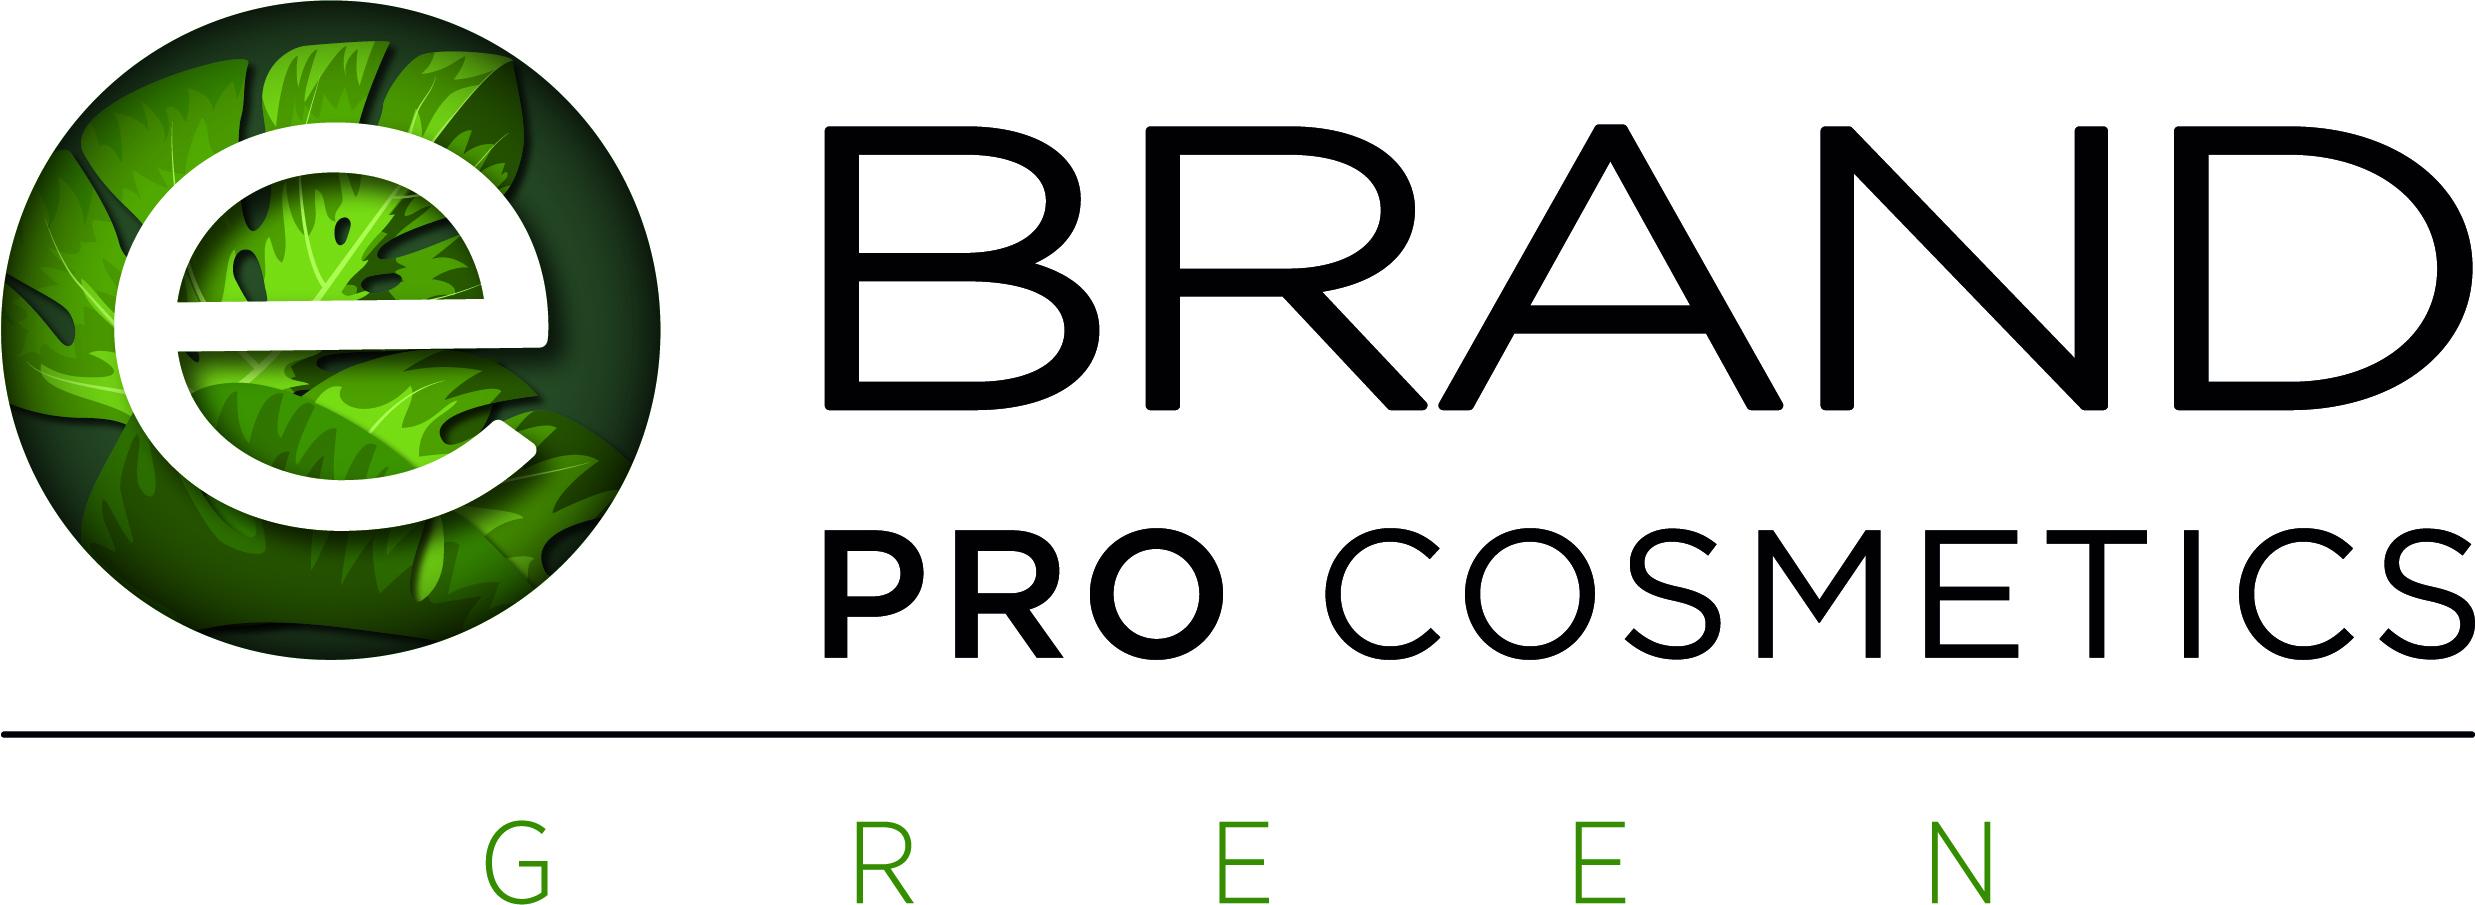 Ebrand Pro Cosmetics